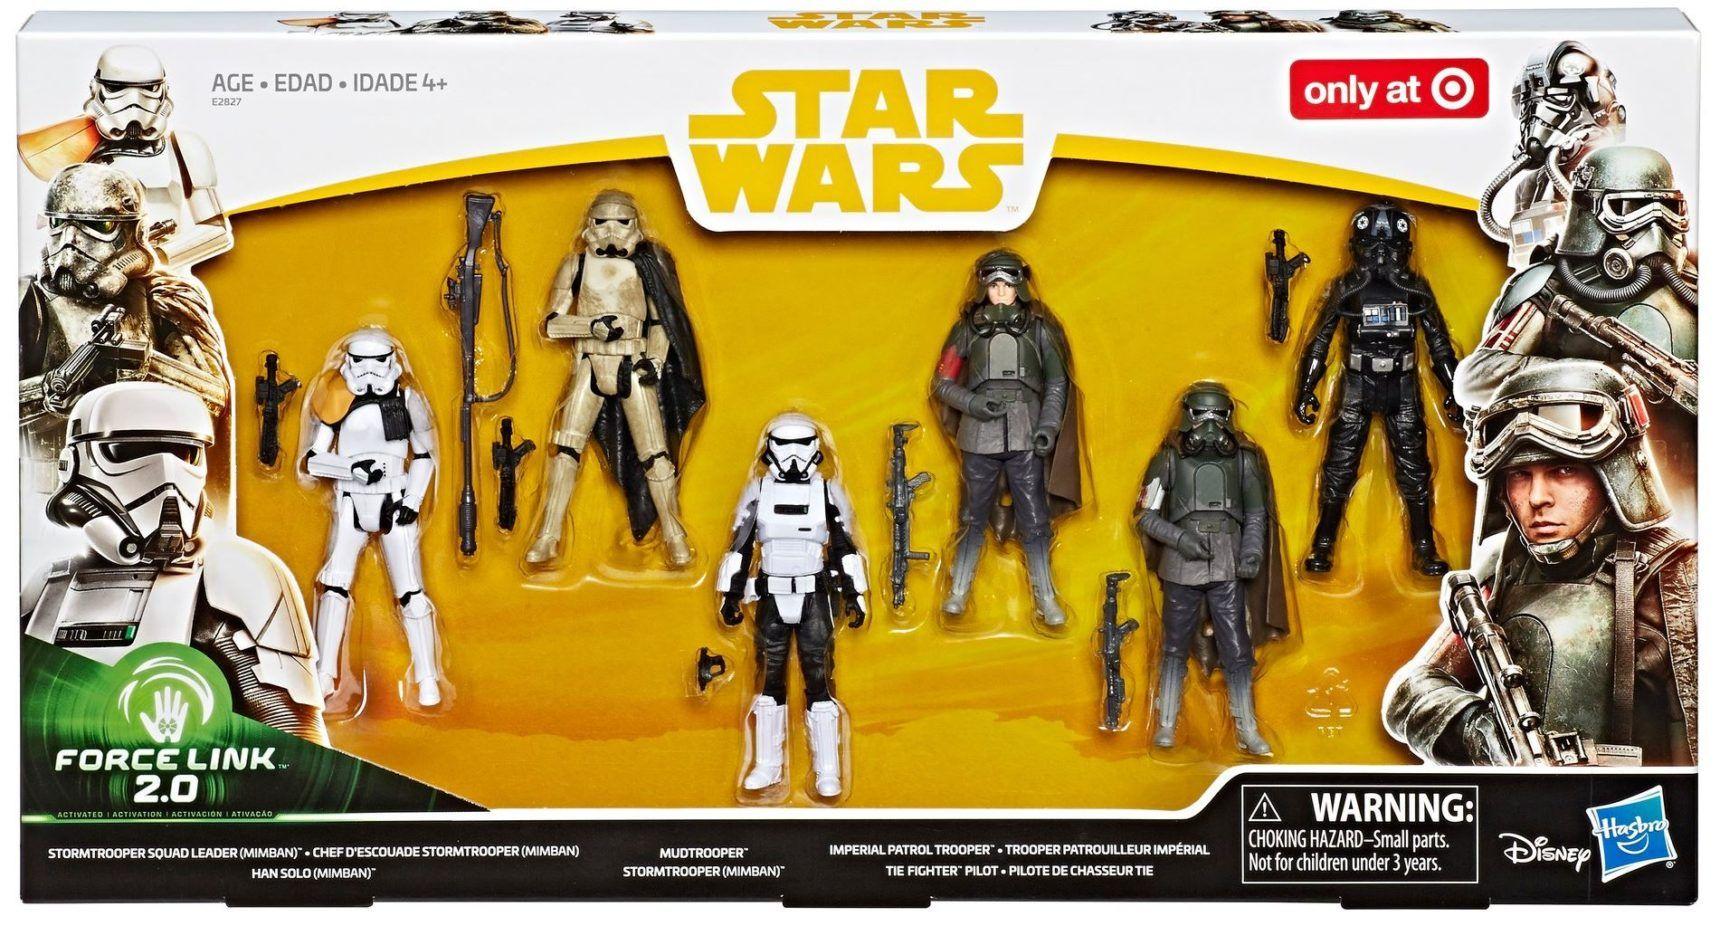 Star Wars Han Solo Force Link 2.0 mine Escape